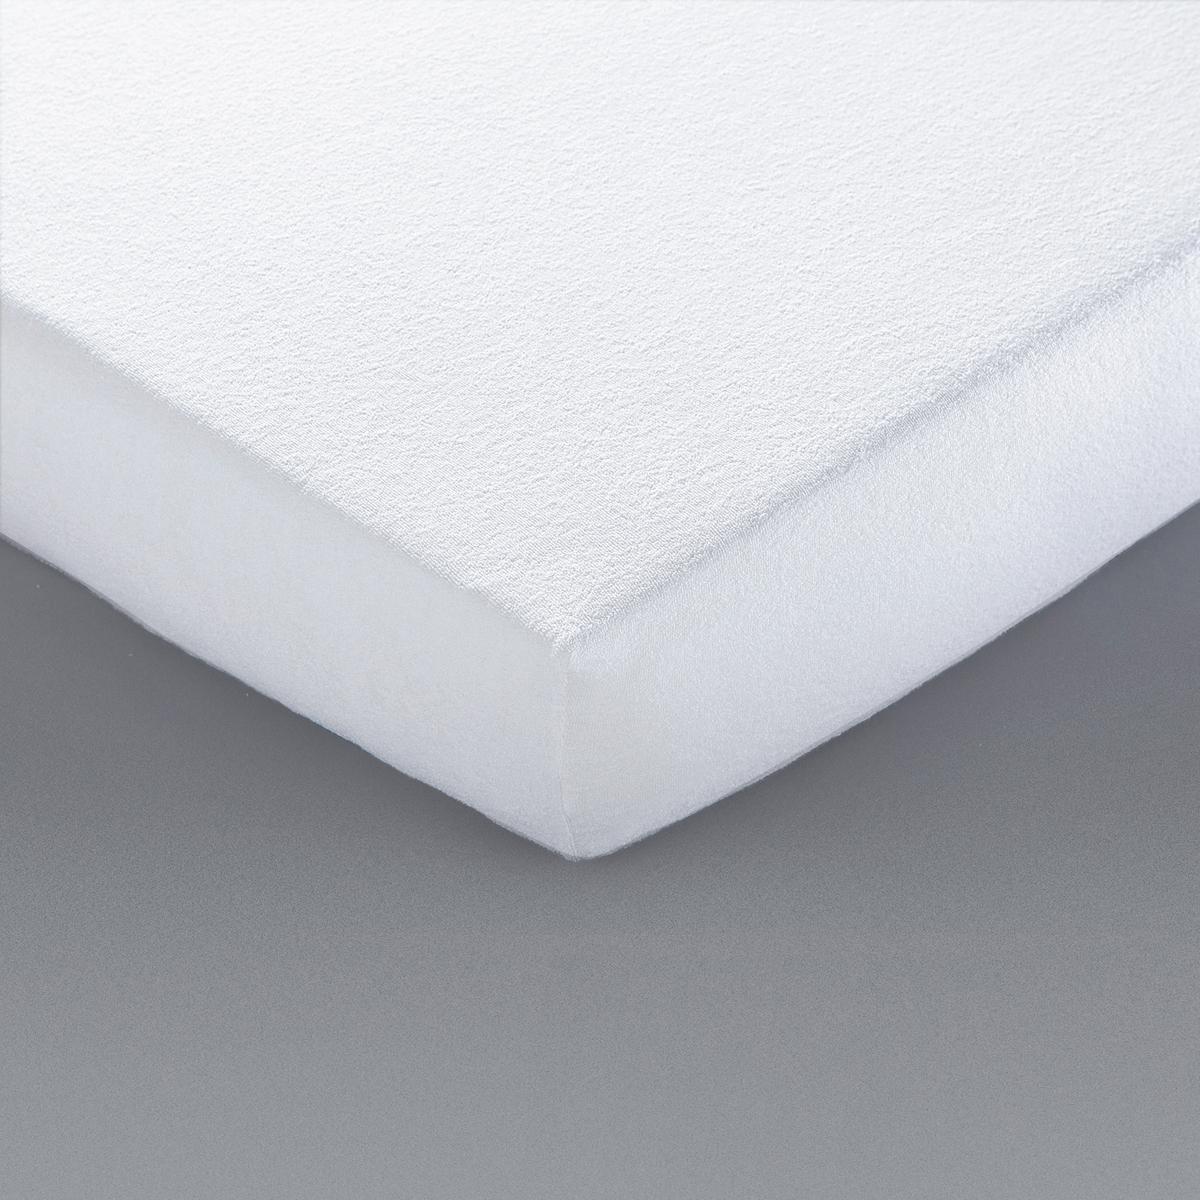 цена на Чехол La Redoute Защитный для матраса собработкой BI-OME 140 x 190 см белый